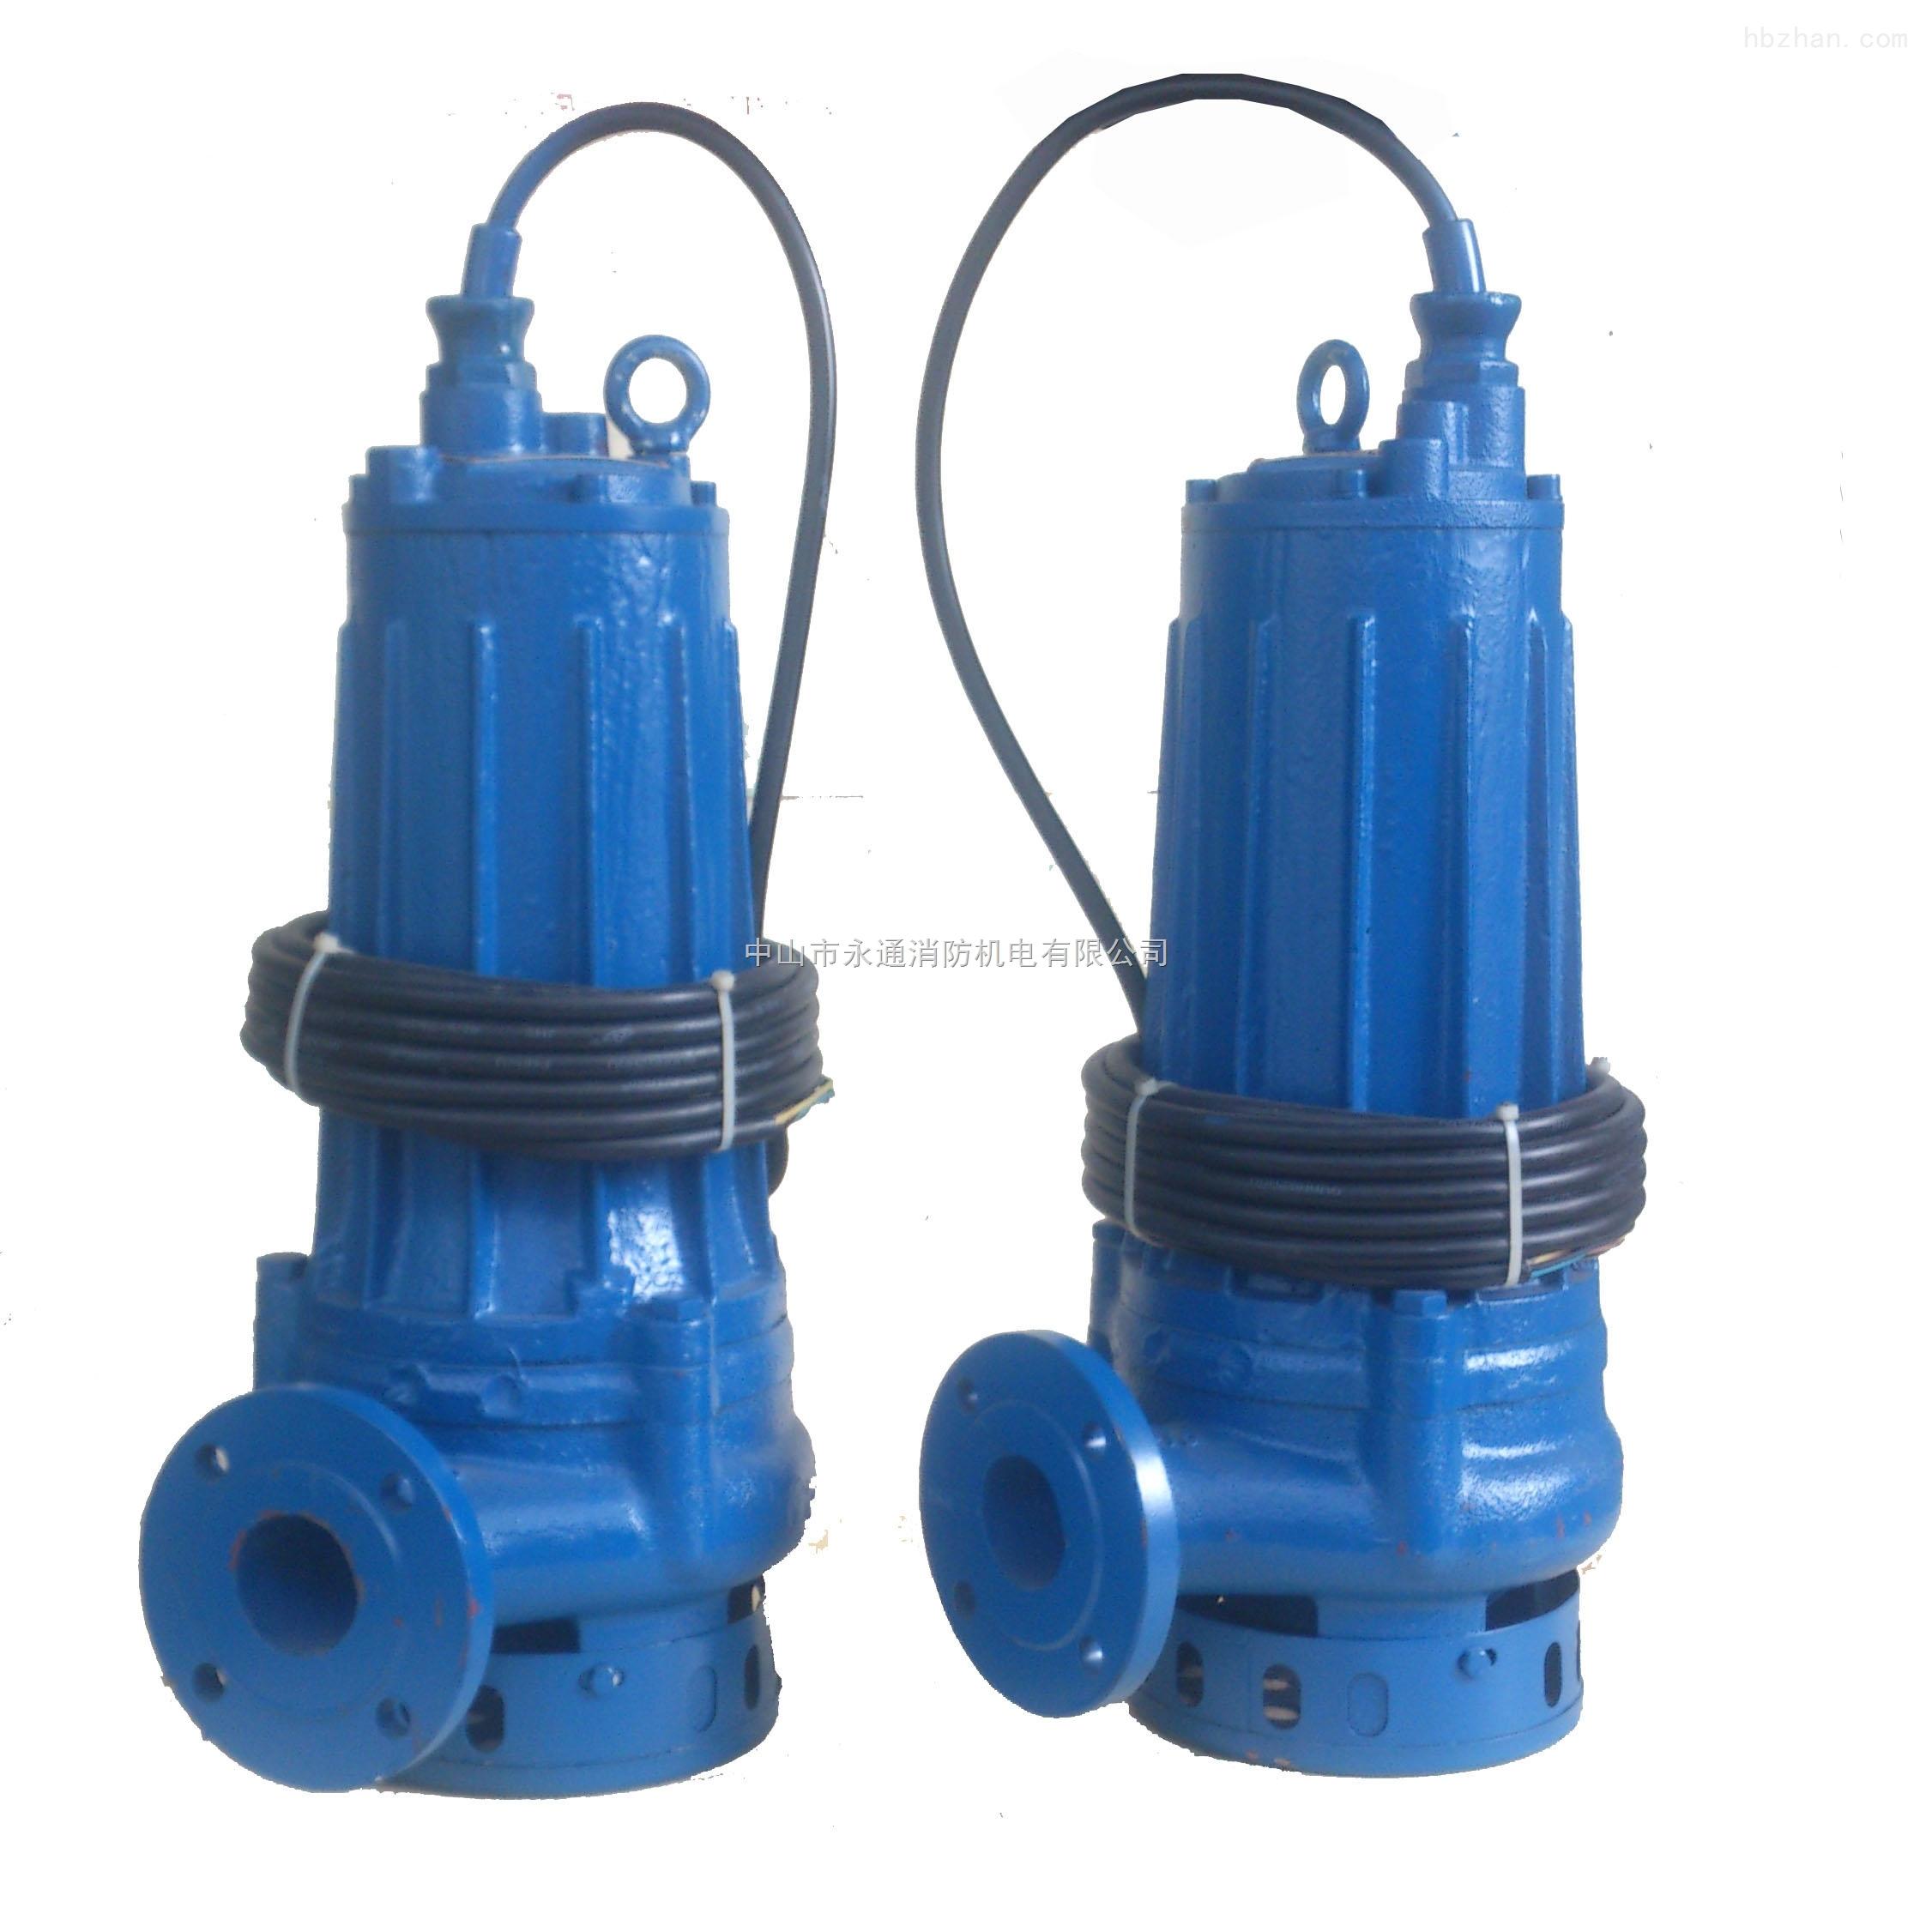 75kw三相电动沉水泵,立式液下泵